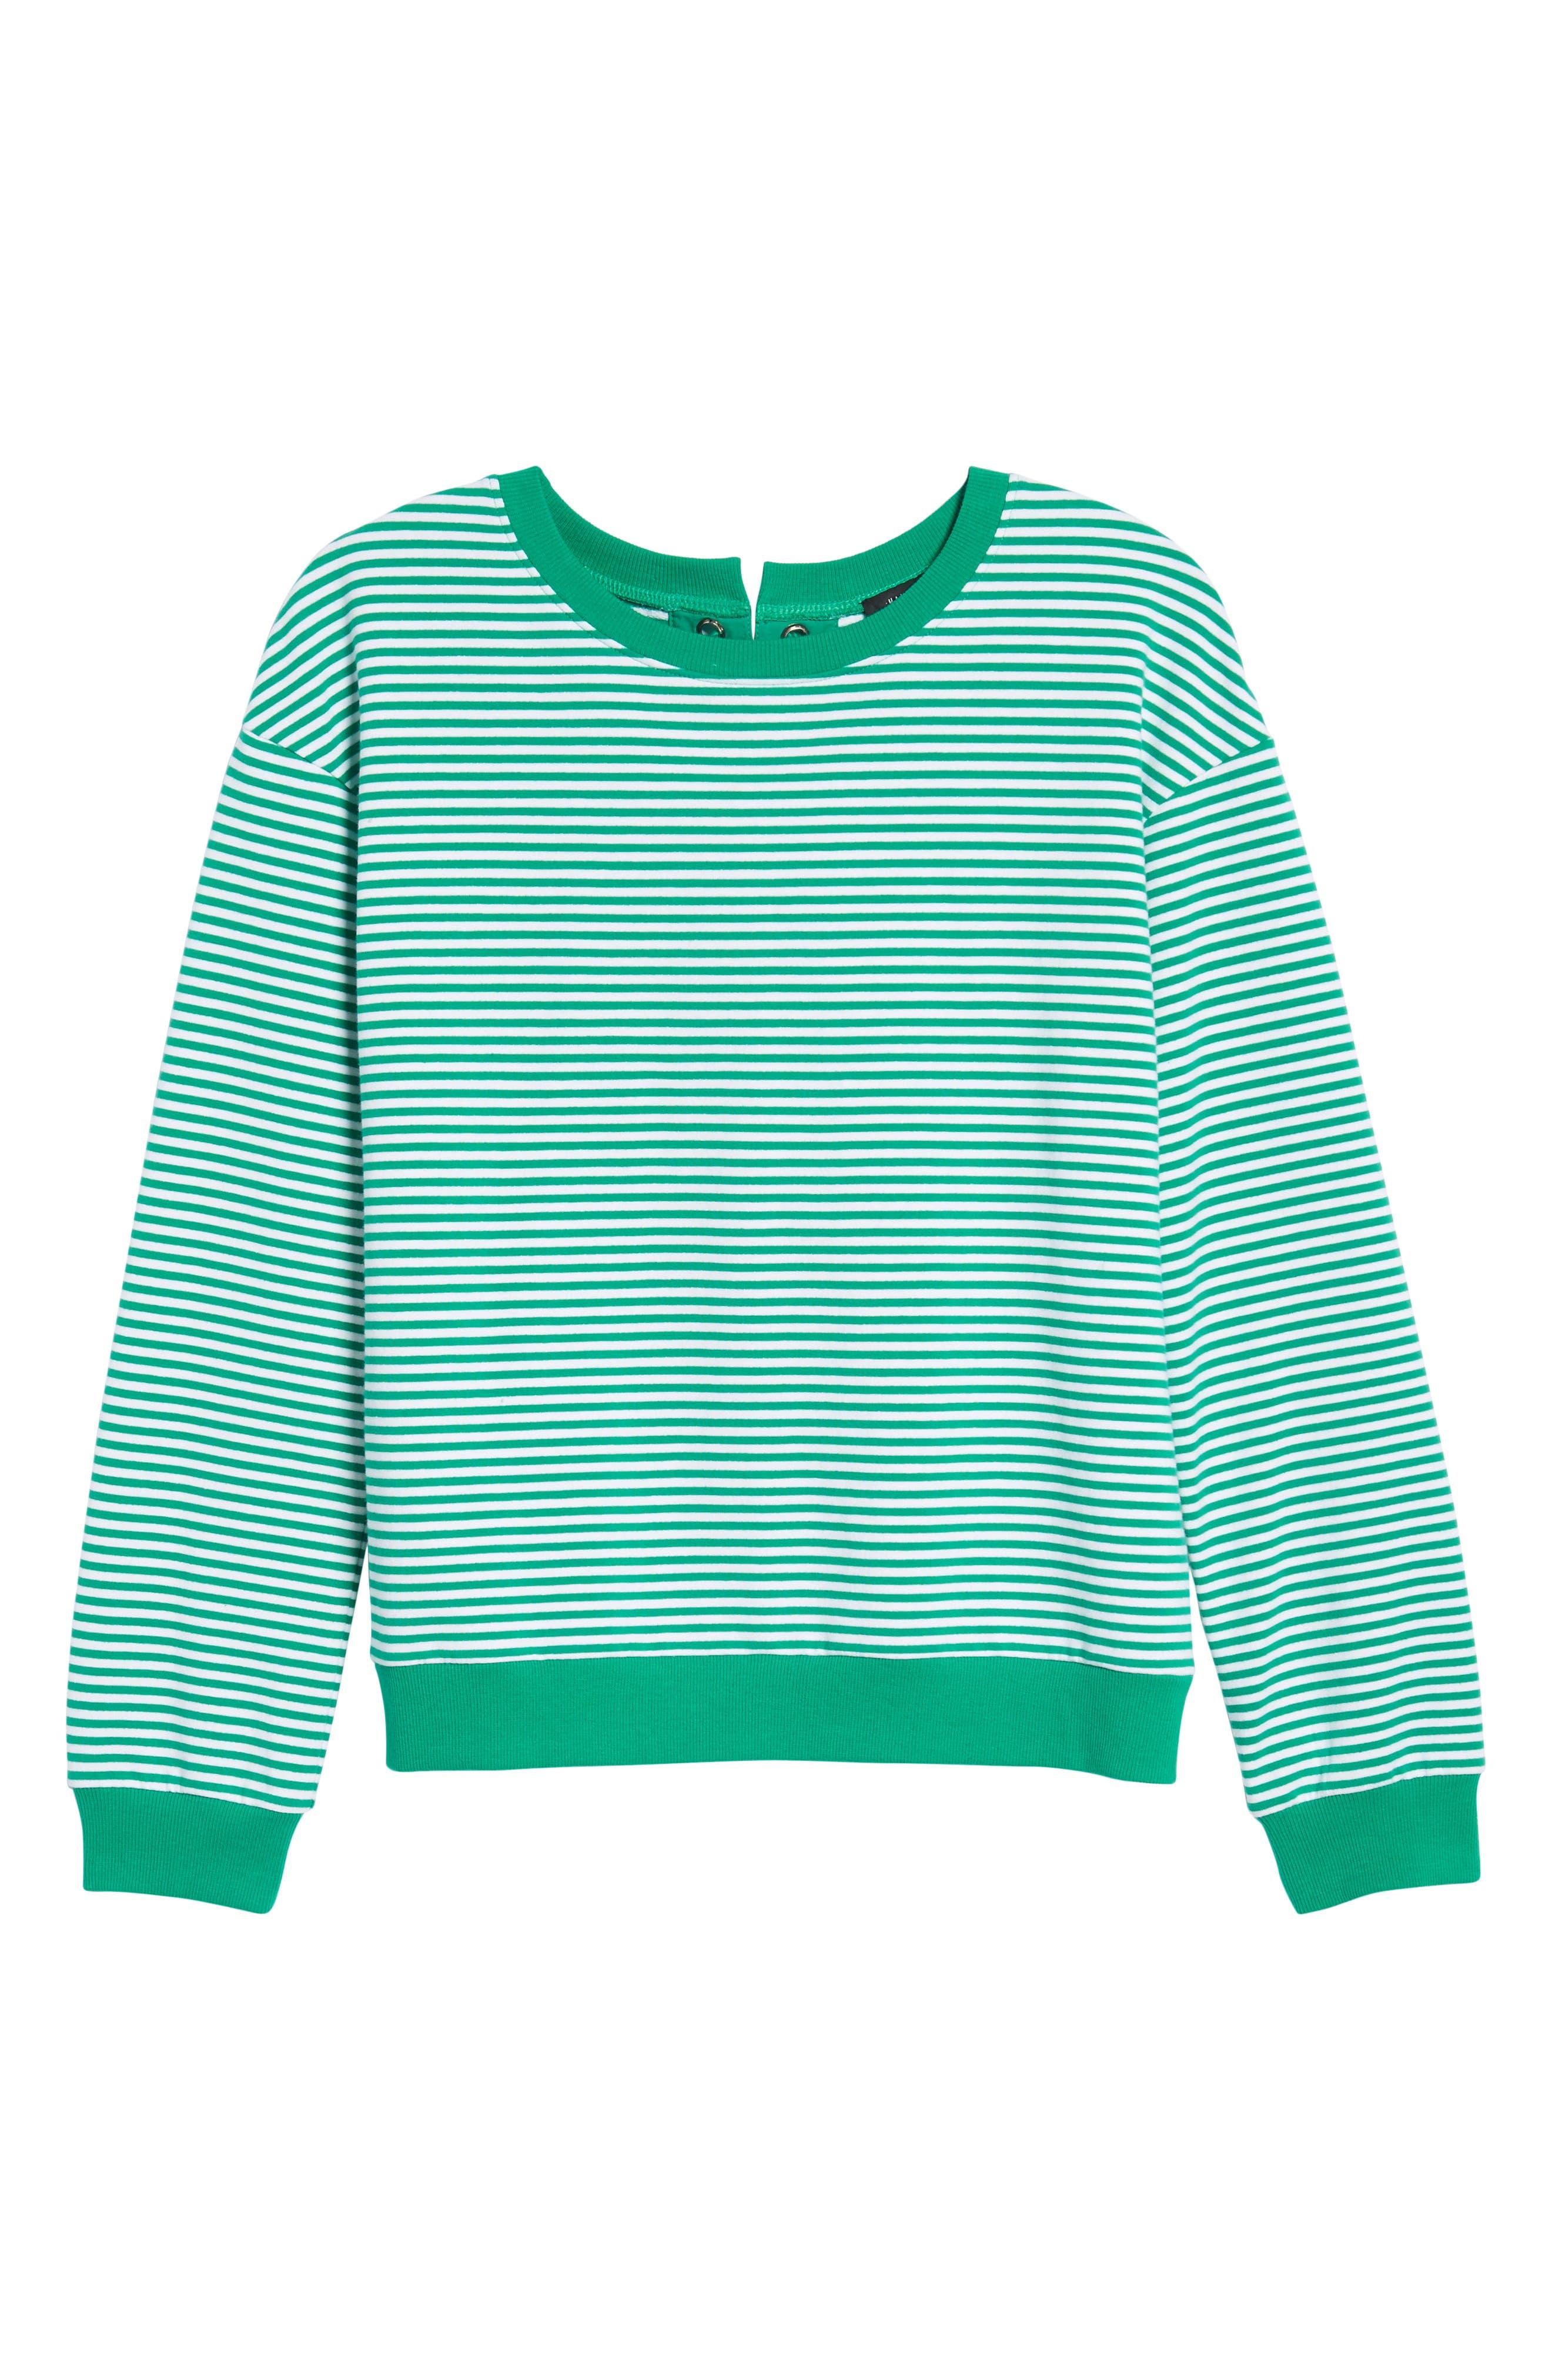 Lace-Up Knit Top,                             Alternate thumbnail 6, color,                             310